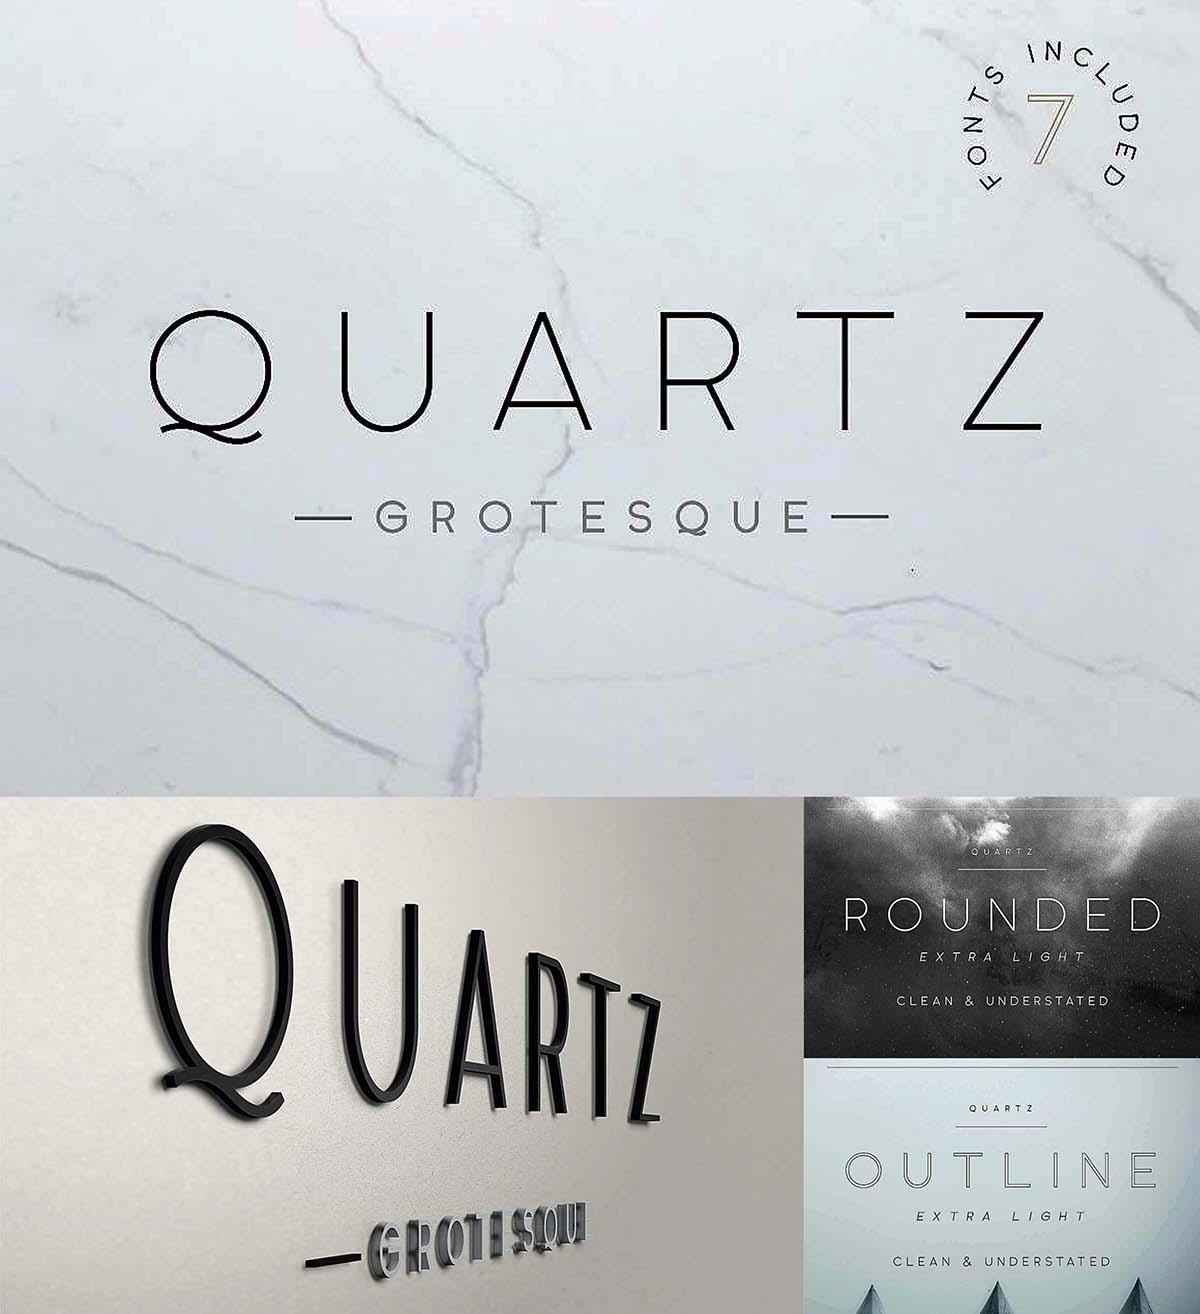 Quartz Grotesque 7 font styles   Free download